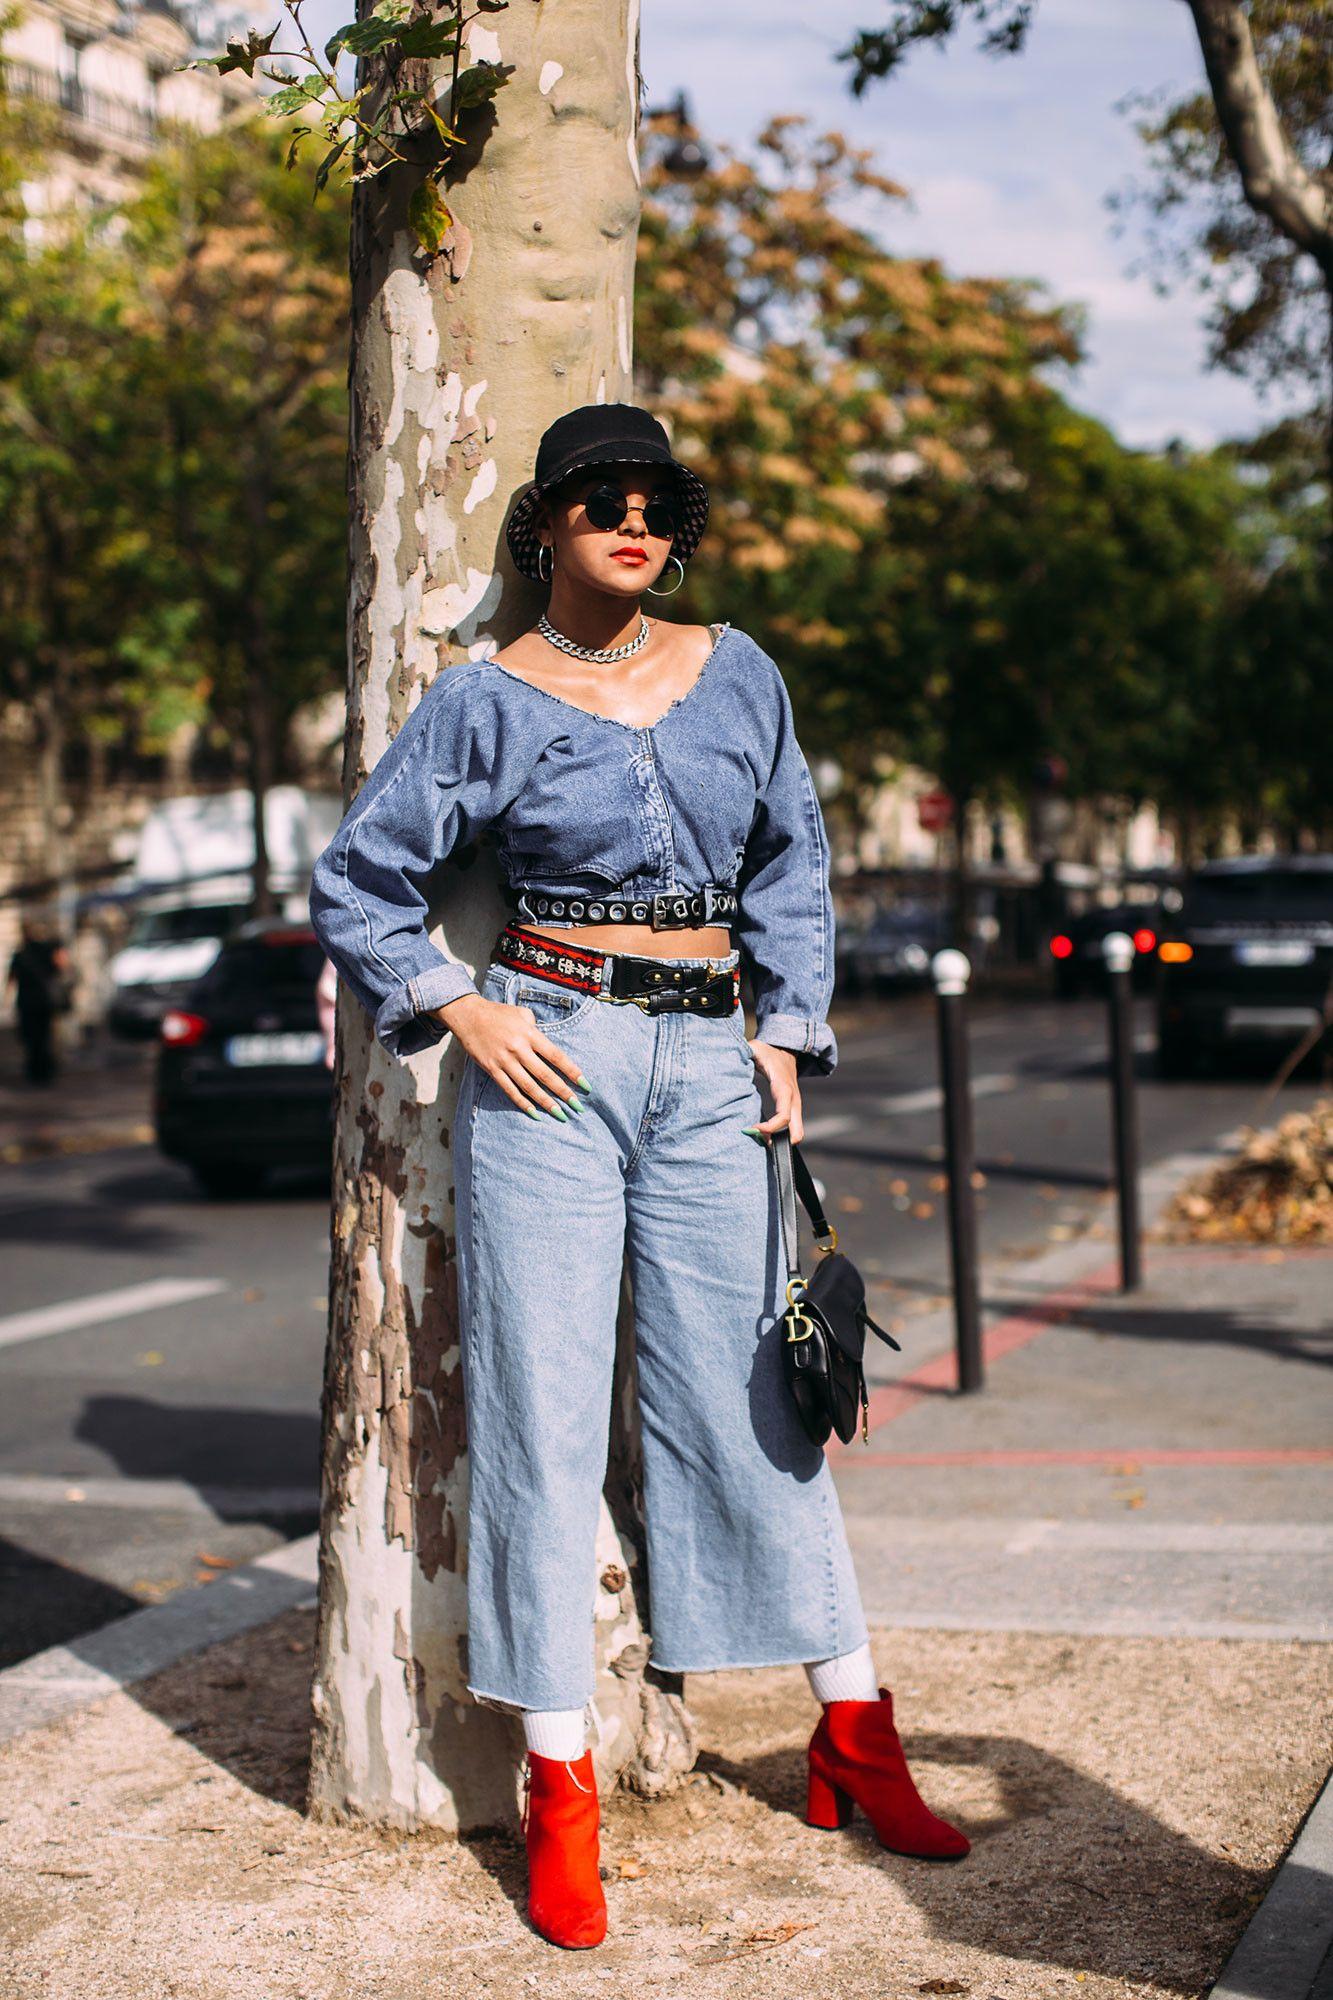 Photo of Come indossare pantaloni larghi palazzo, slouchy, culotte, svasati, sacco di carta …